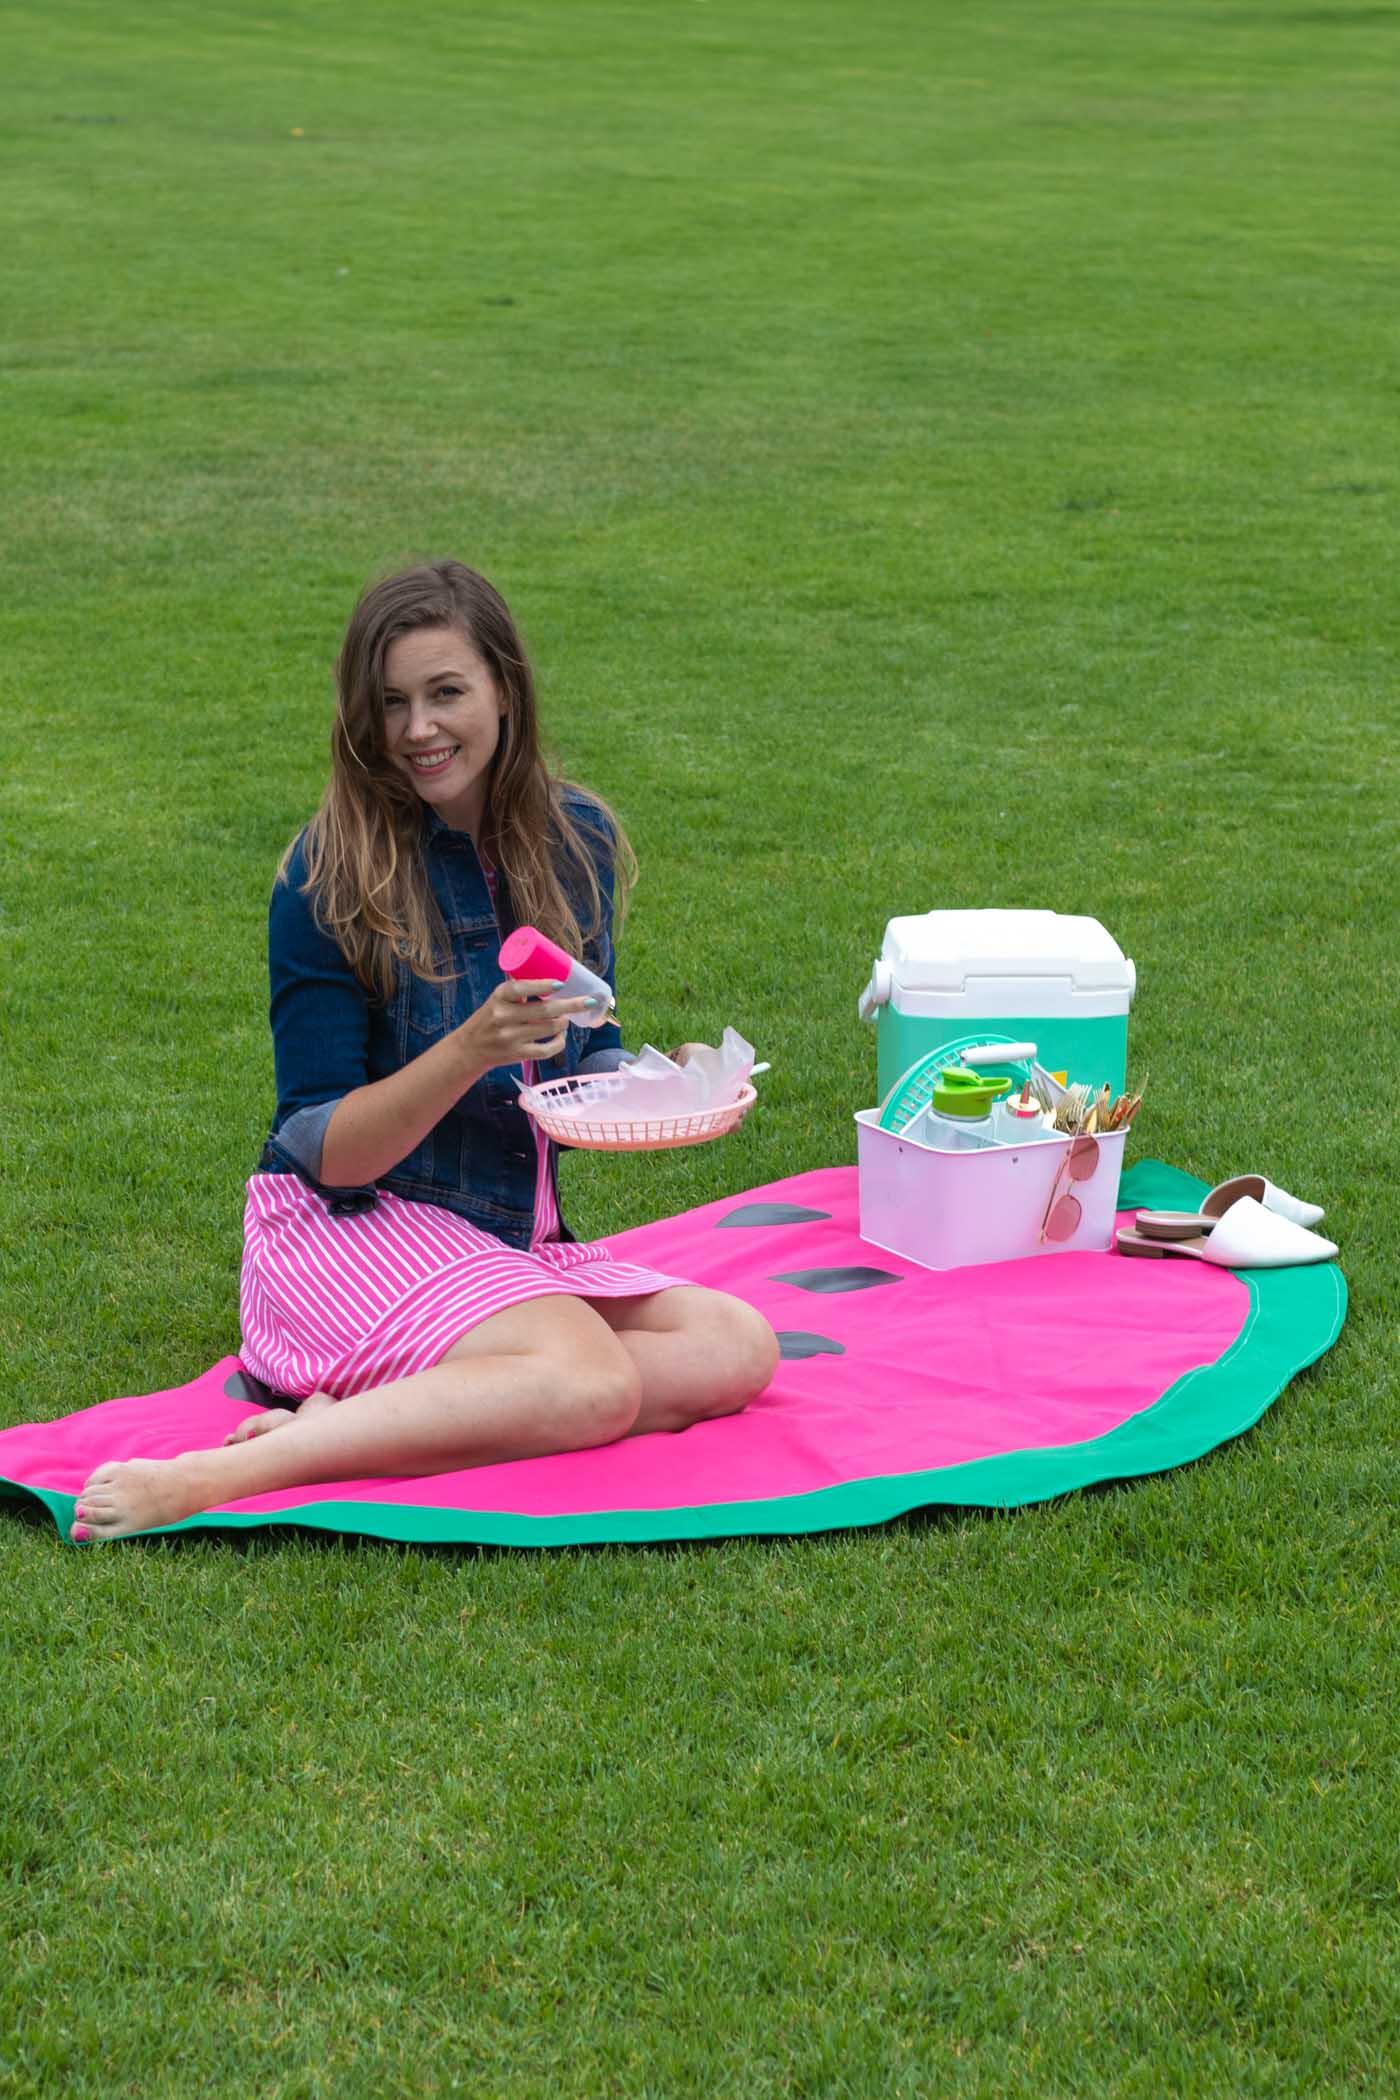 DIY Watermelon Picnic Blanket Sewing Tutorial | Club Crafted